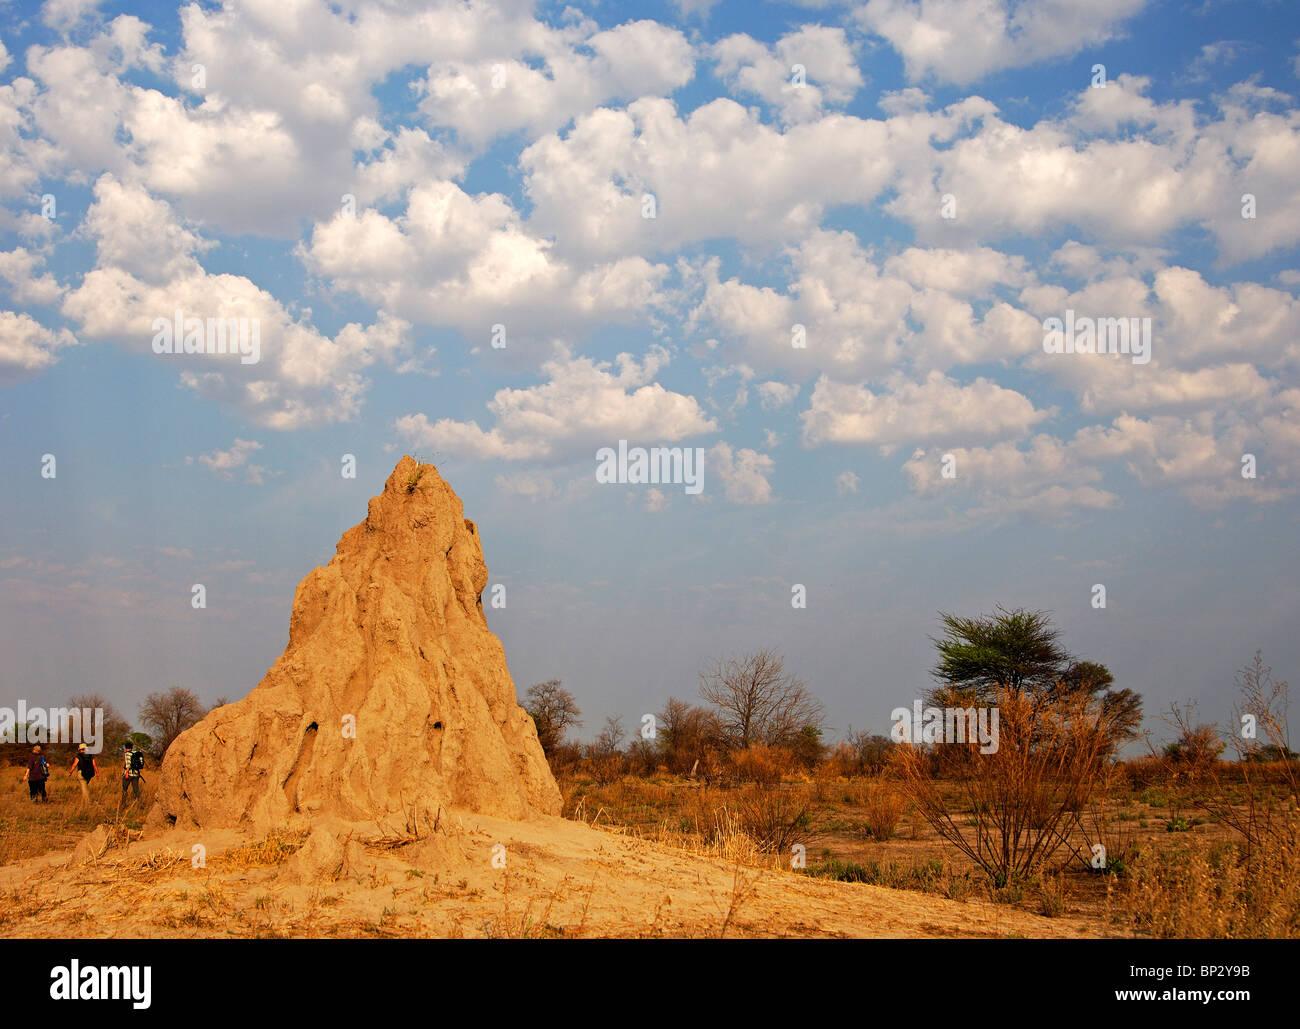 Termite mound under cumulus clouds, Okavango Delta, Botswana - Stock Image